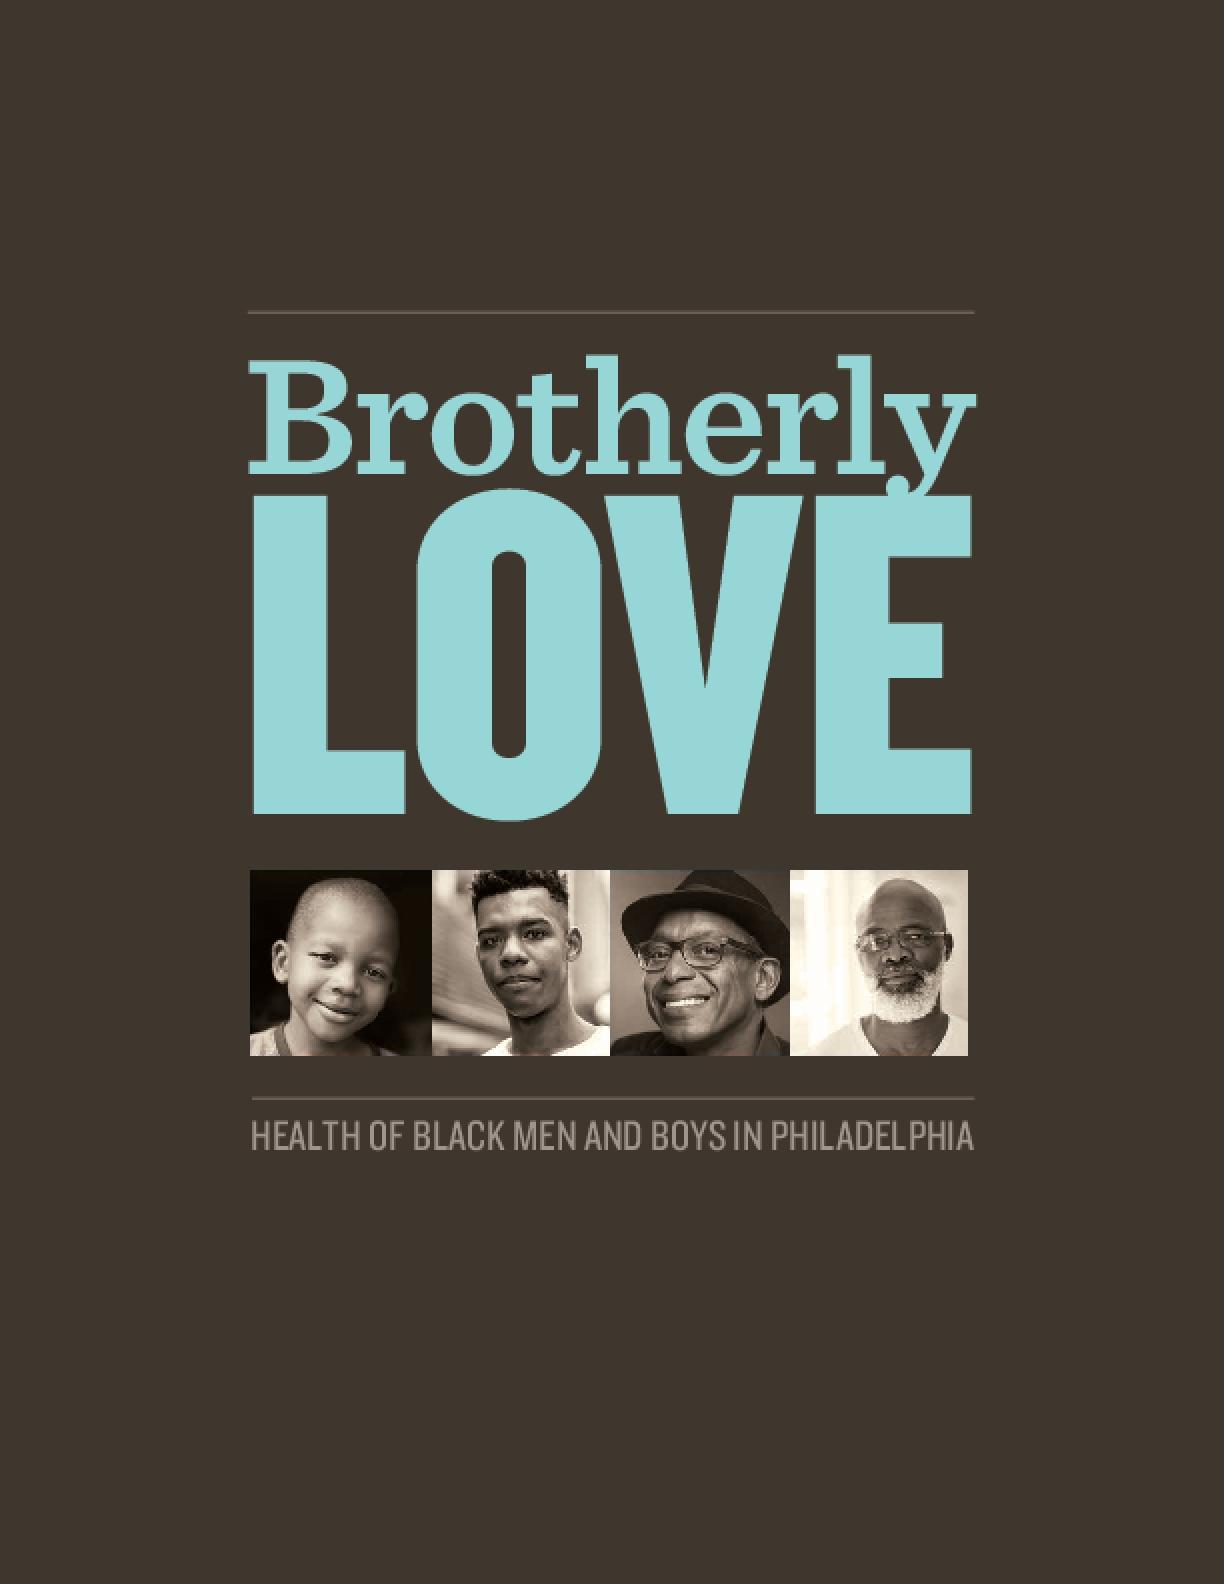 Brotherly Love: Health of Black Men and Boys in Philadelphia